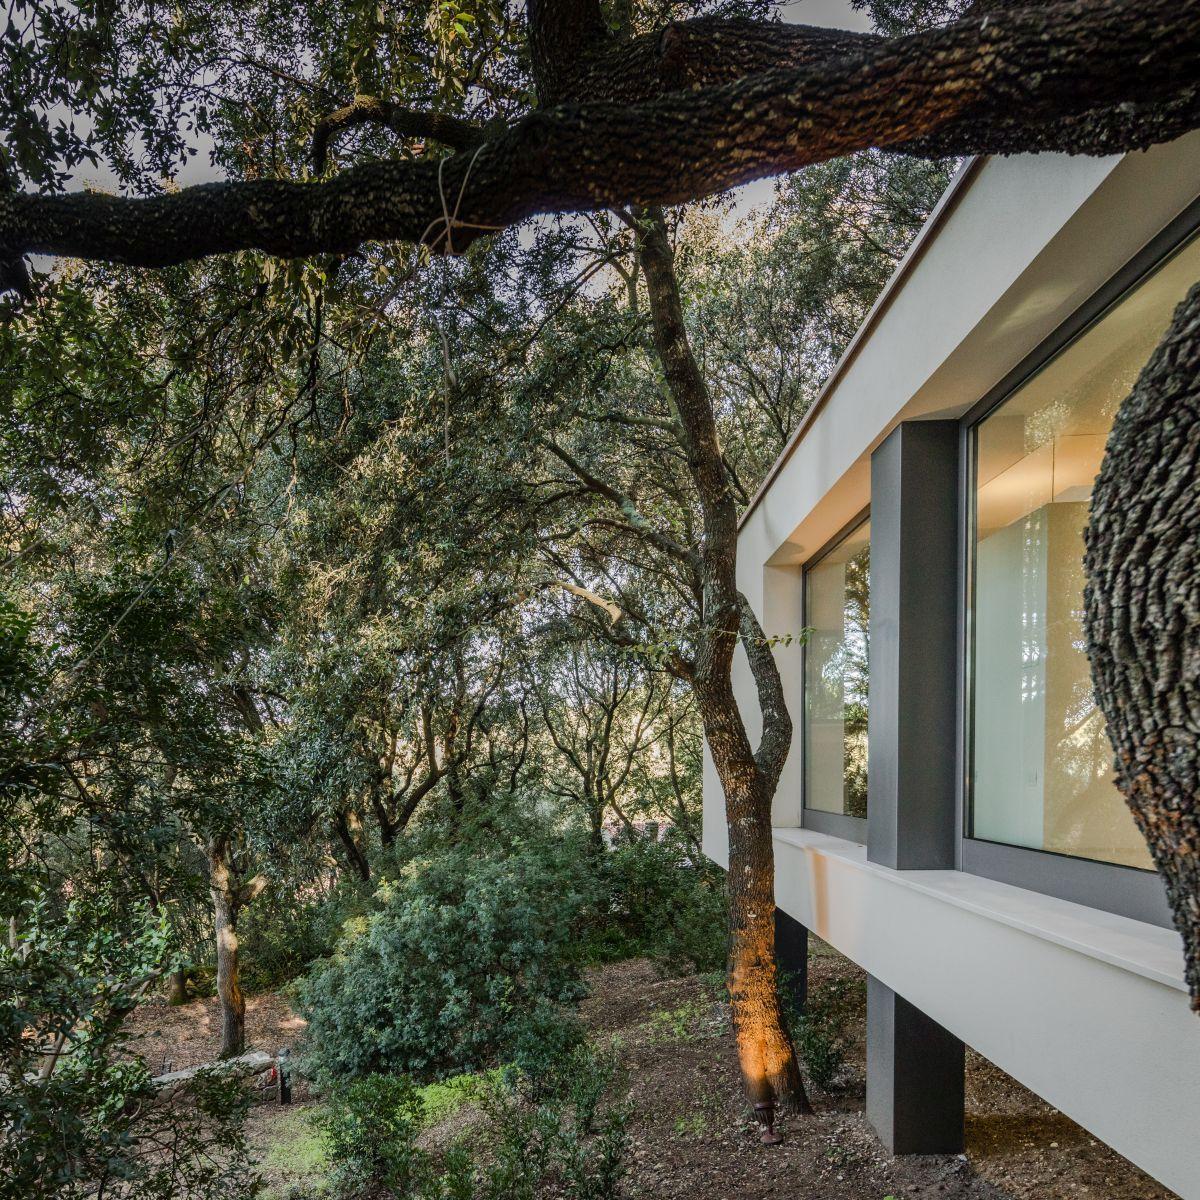 Casa nel Bosco surrounded by oak forest